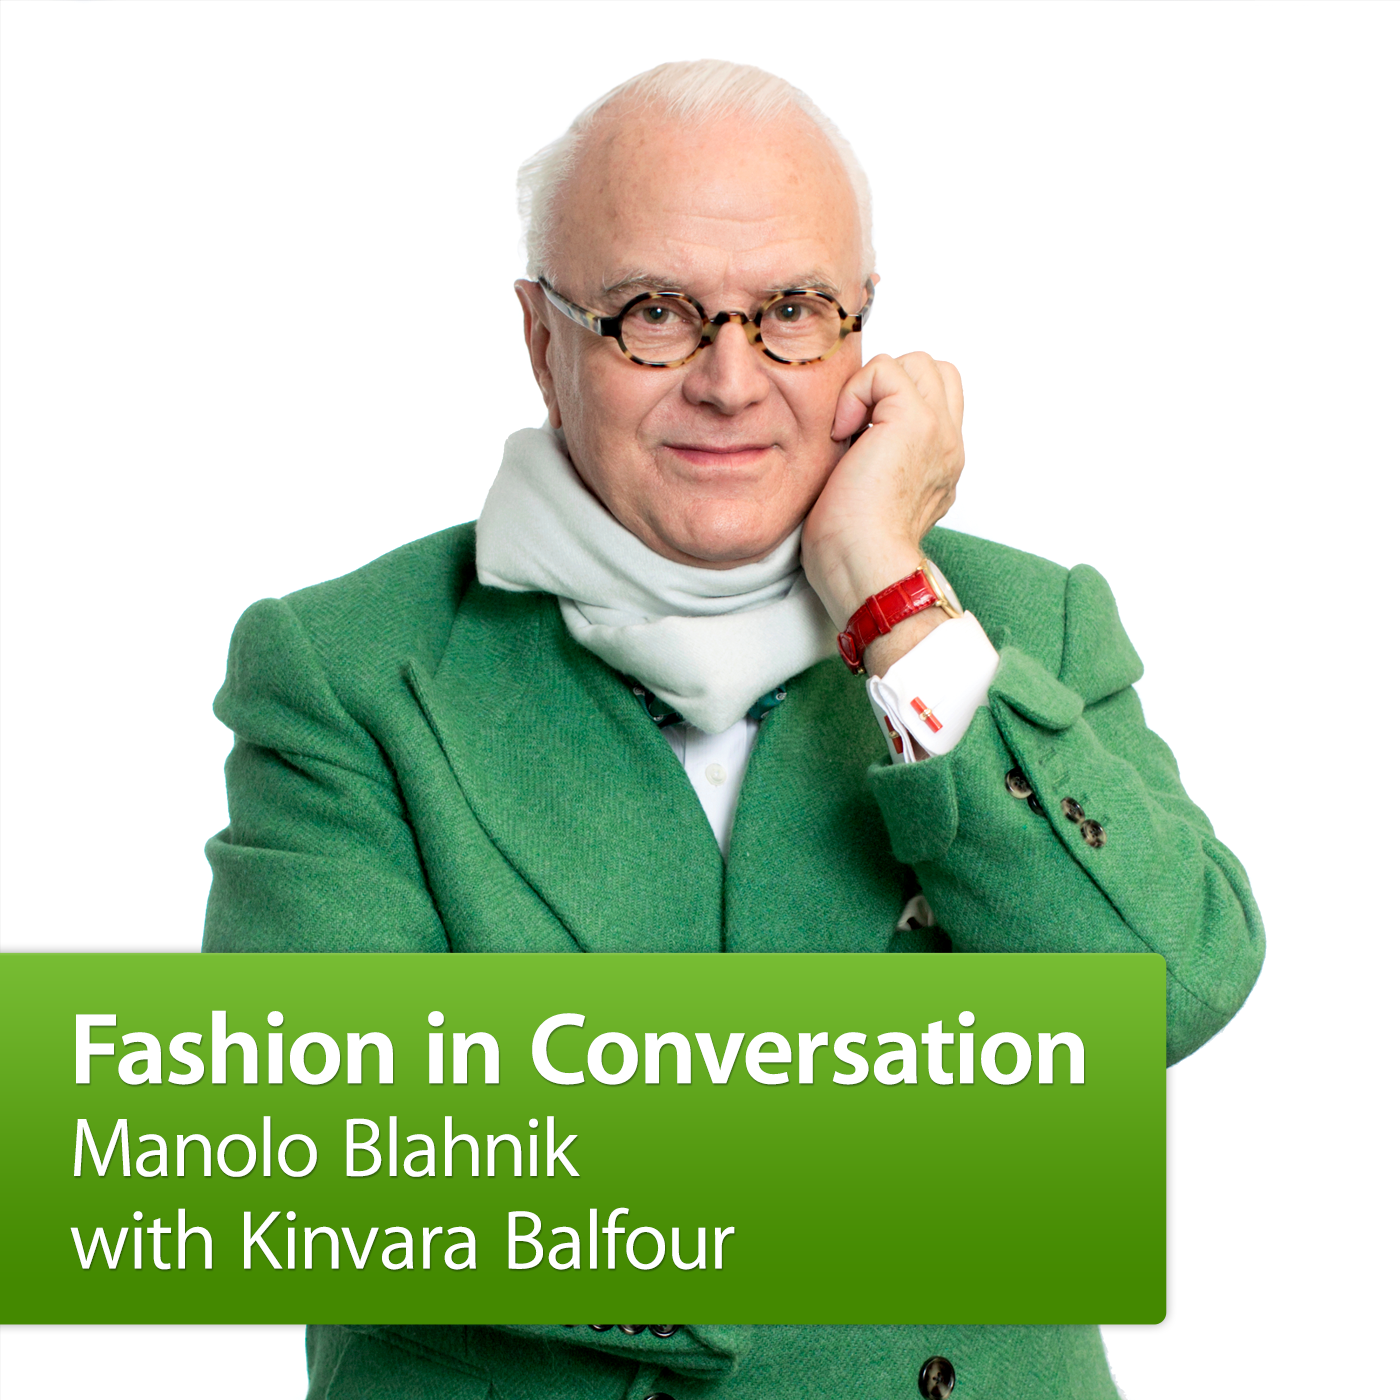 Manolo Blahnik with Kinvara Balfour